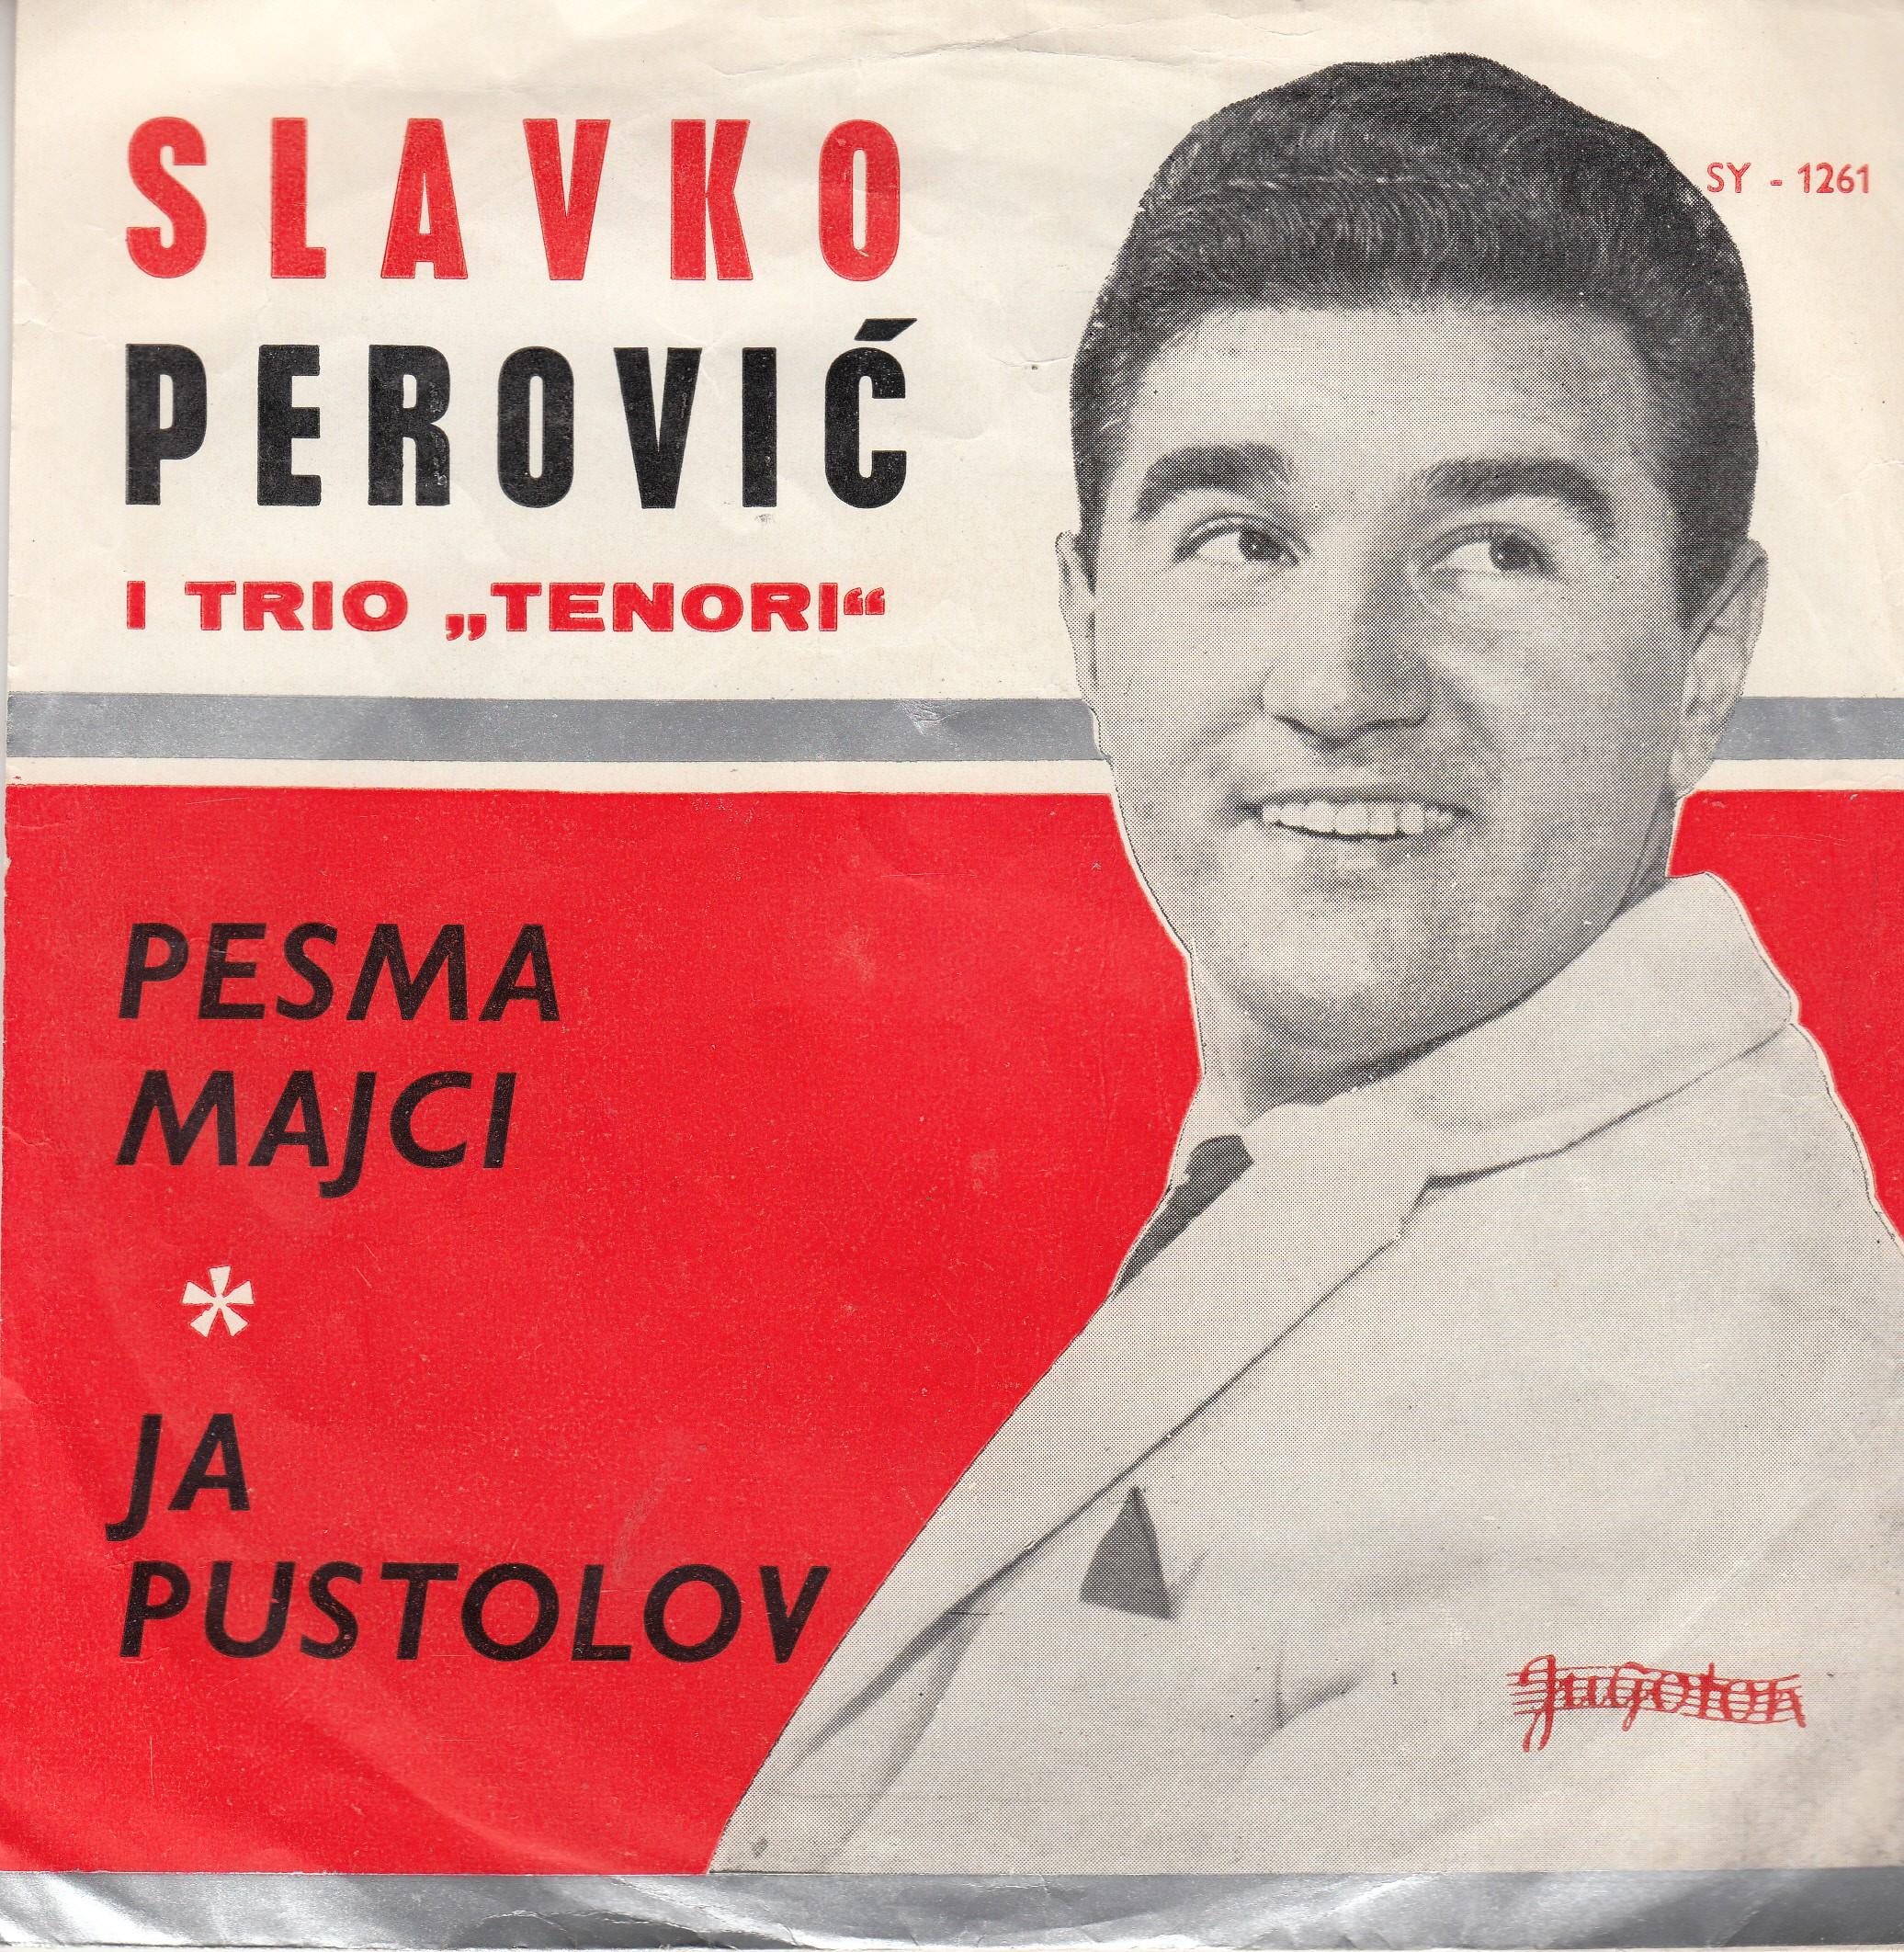 Perovic Slavko - Pesma Majci/ja Pustolov